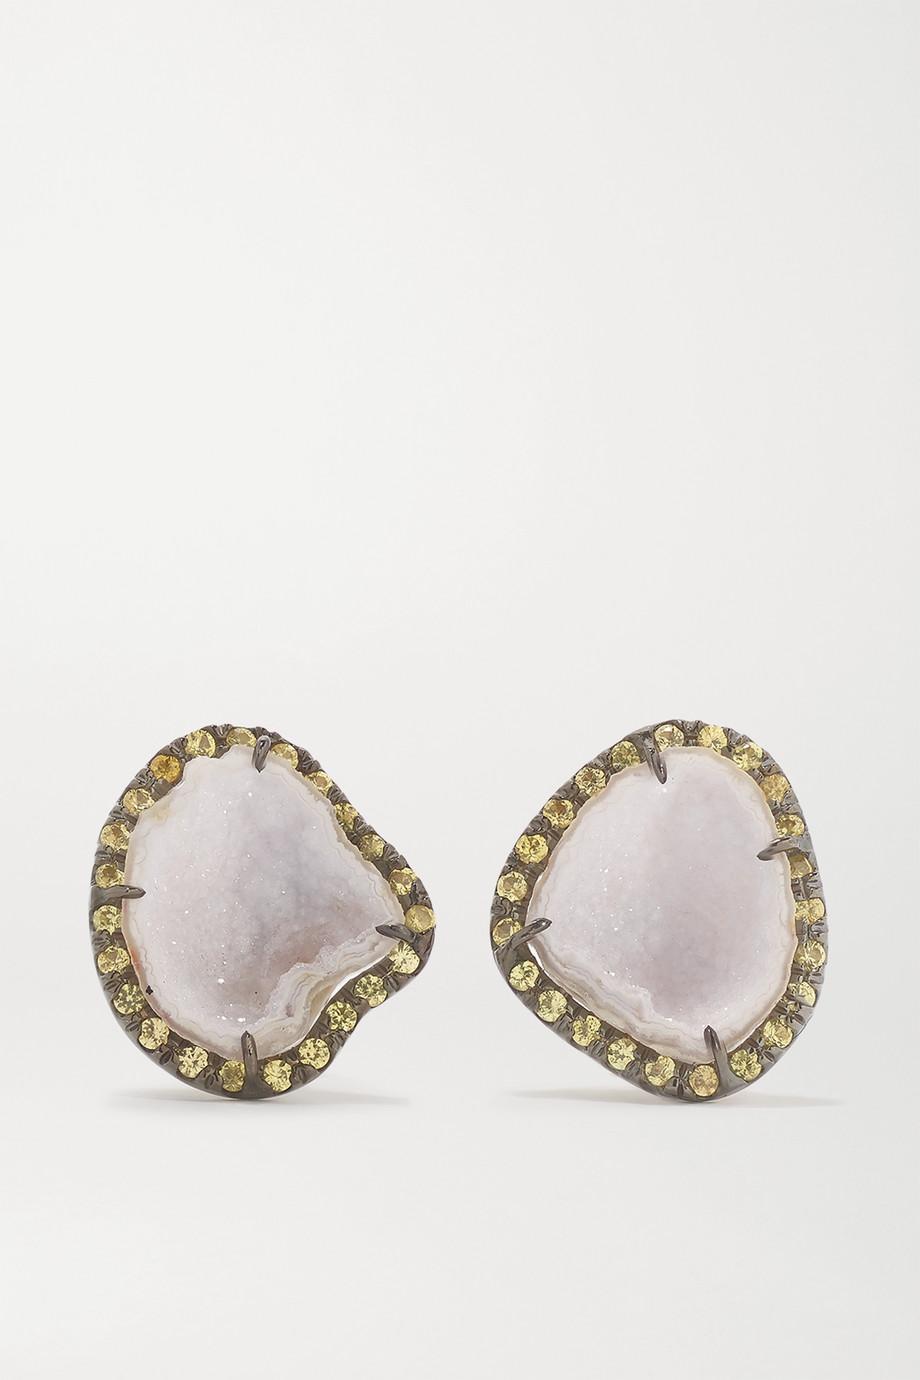 Kimberly McDonald Boucles d'oreilles en or blanc 18 carats noirci, géodes et saphirs